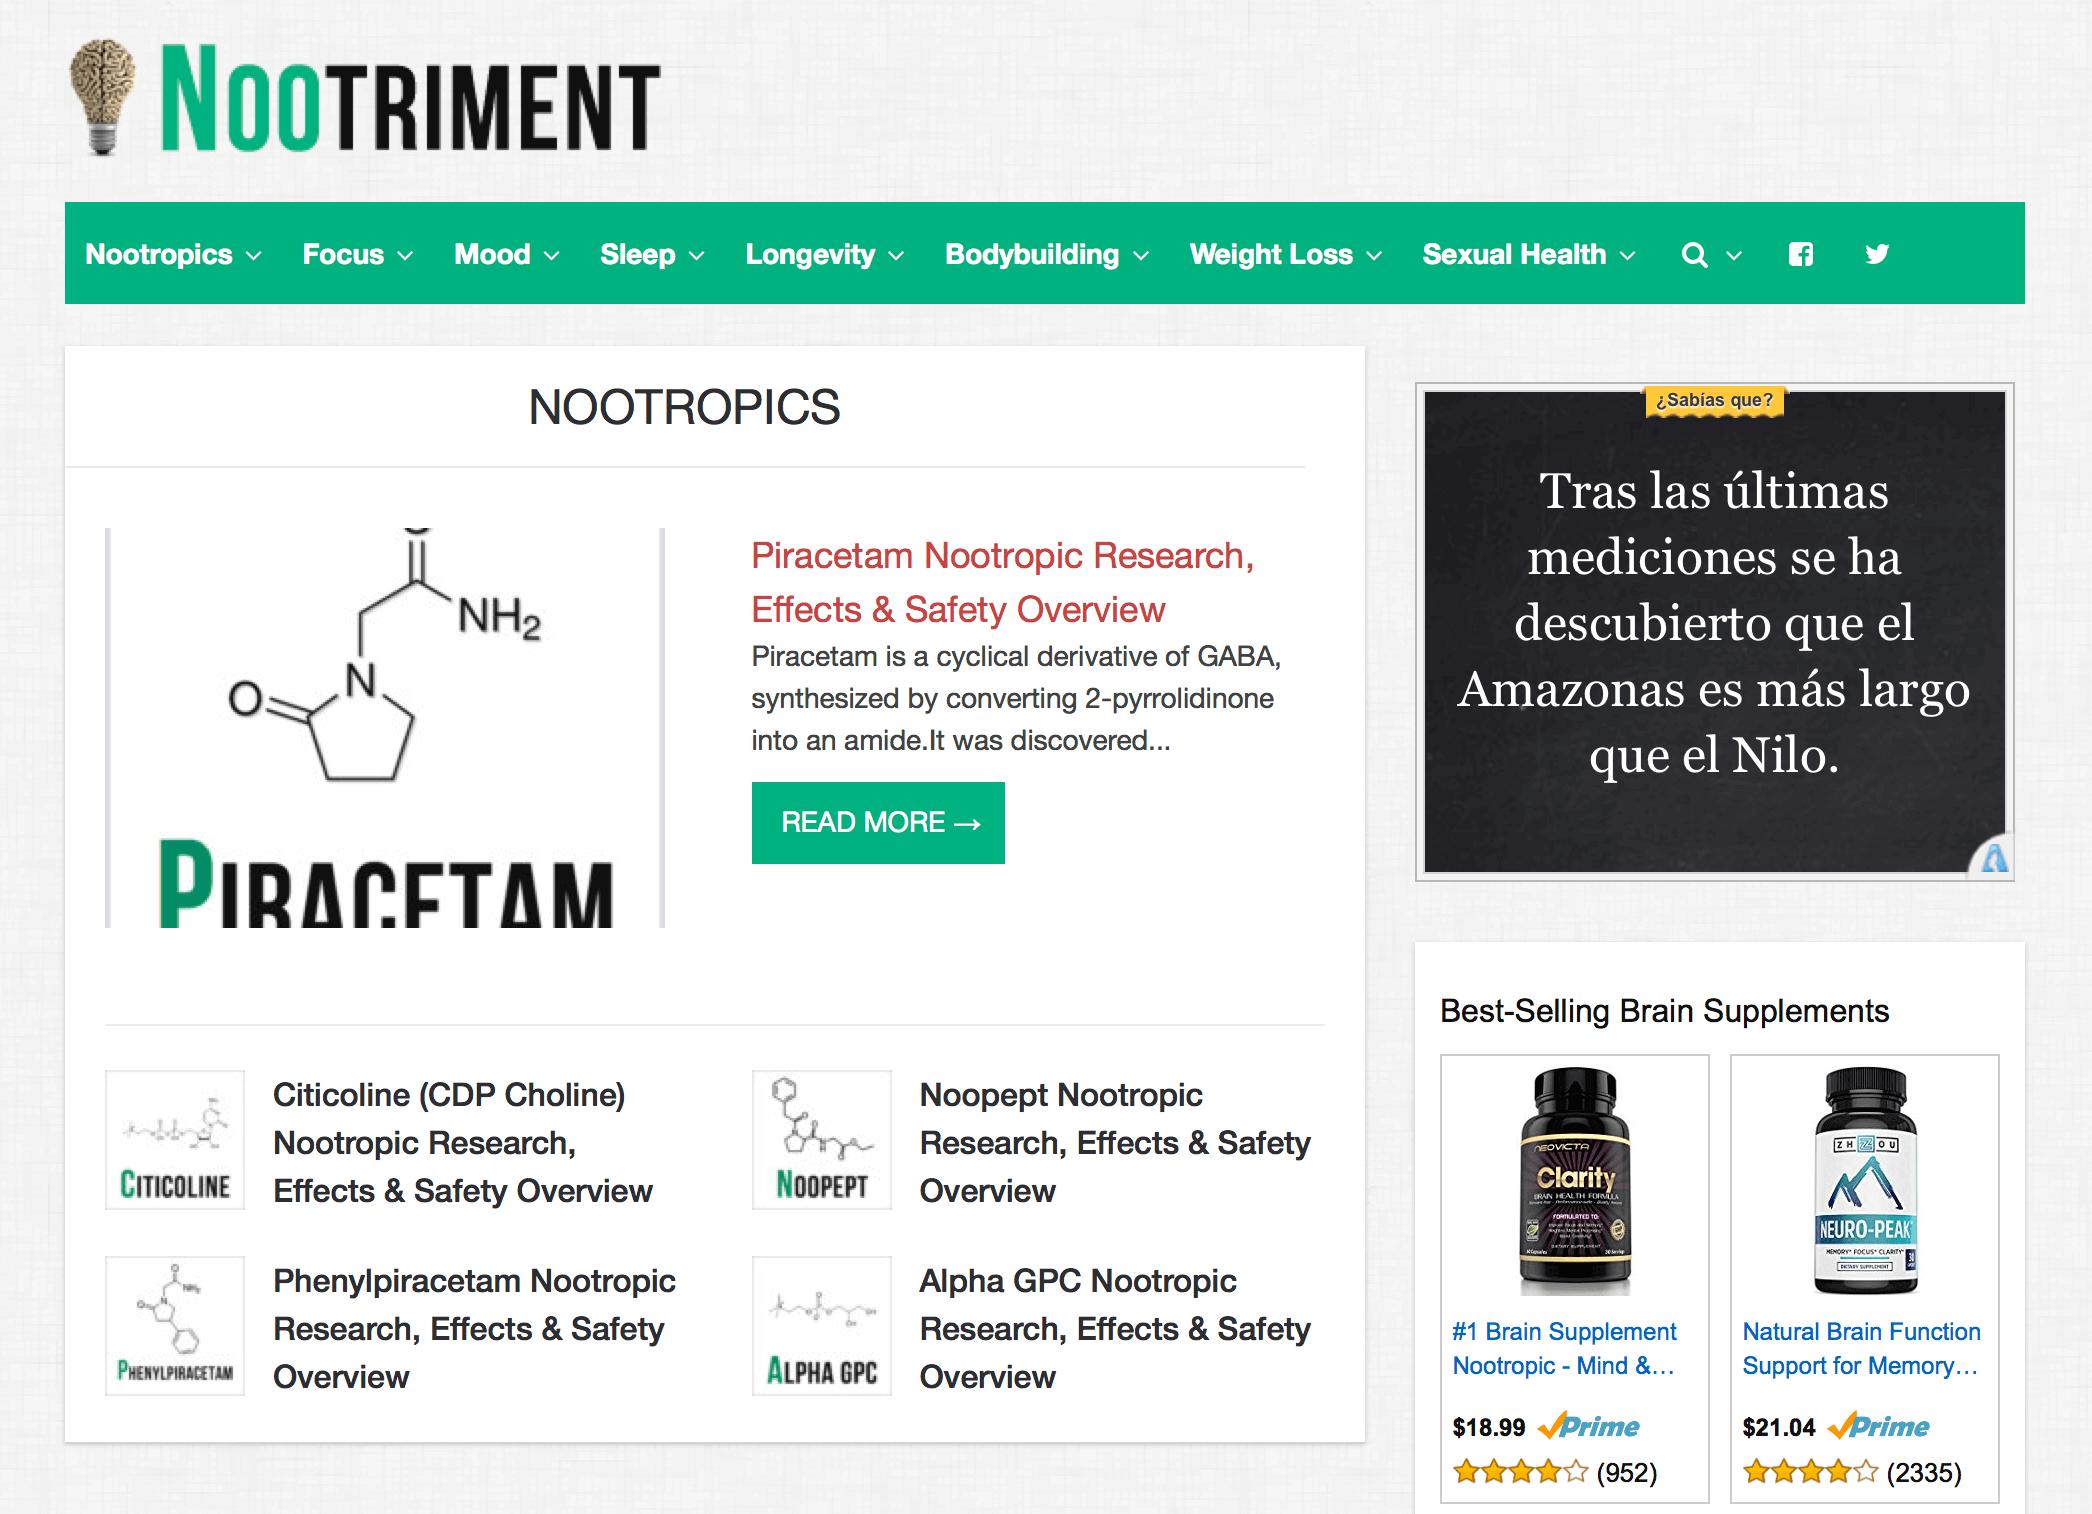 Nootriment.com Pharmacy Review